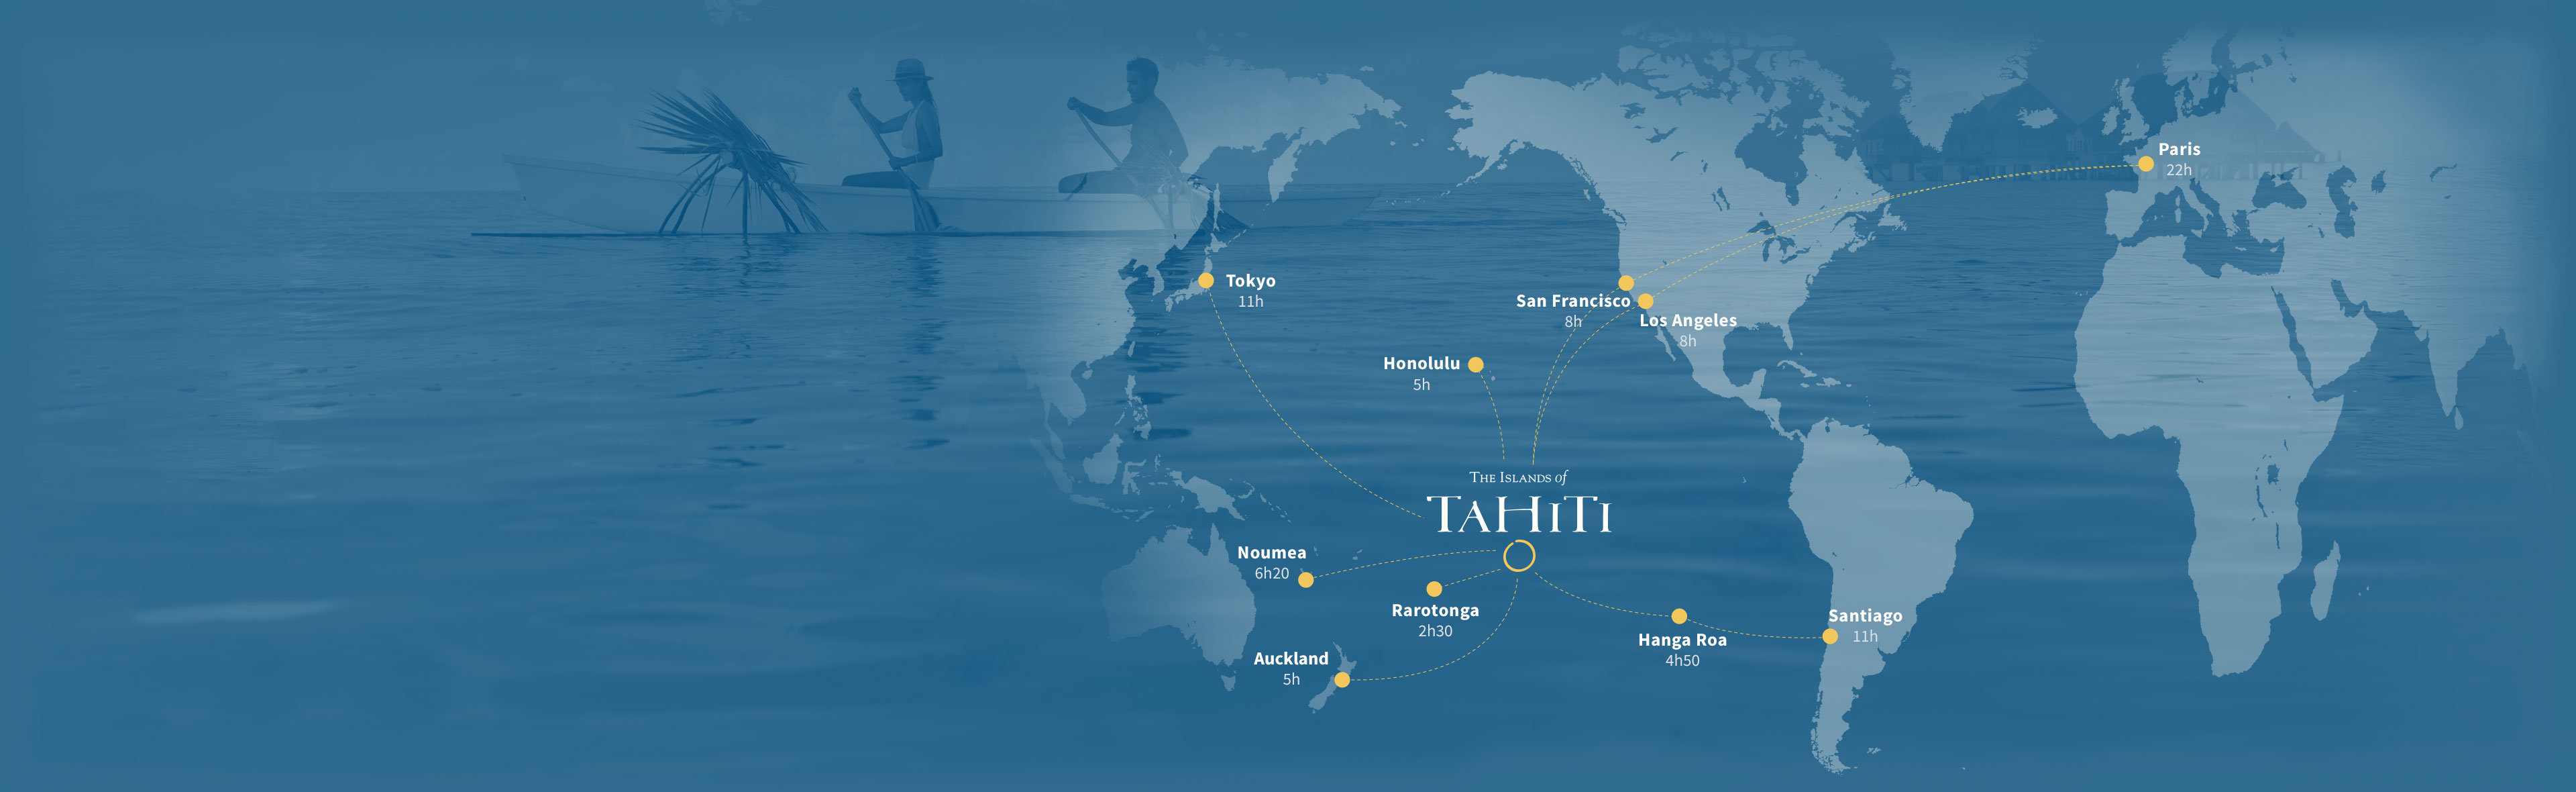 Tahiti Tourisme Visit Bora Moorea More Official Lincoln 203 Wiring Diagram 118 Islands